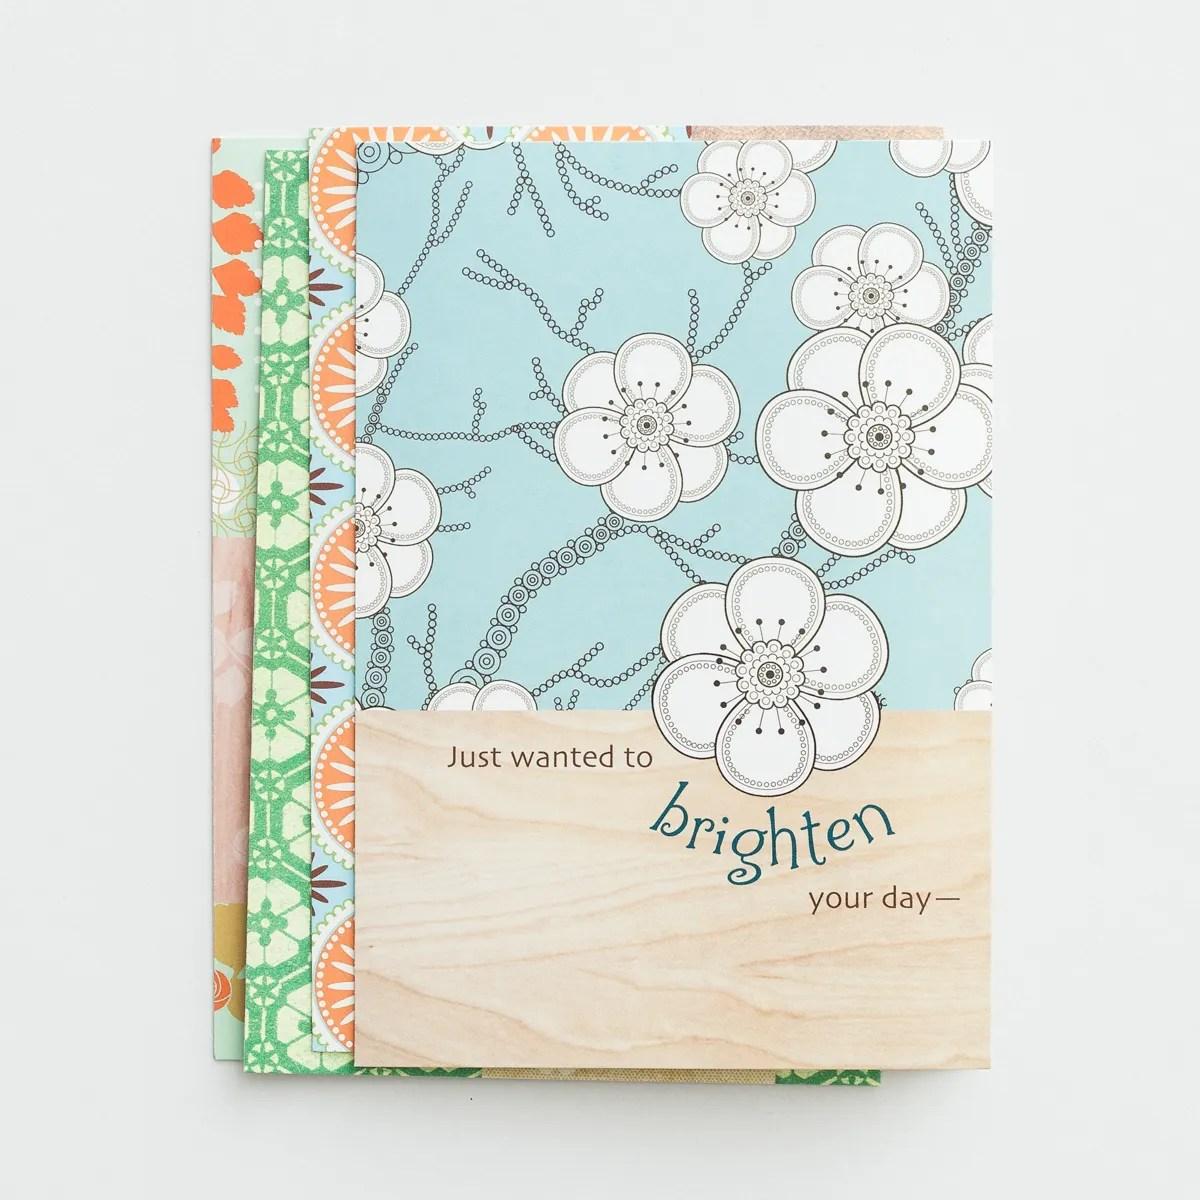 Thinking of You - Joyful Thoughts - 12 Boxed Cards